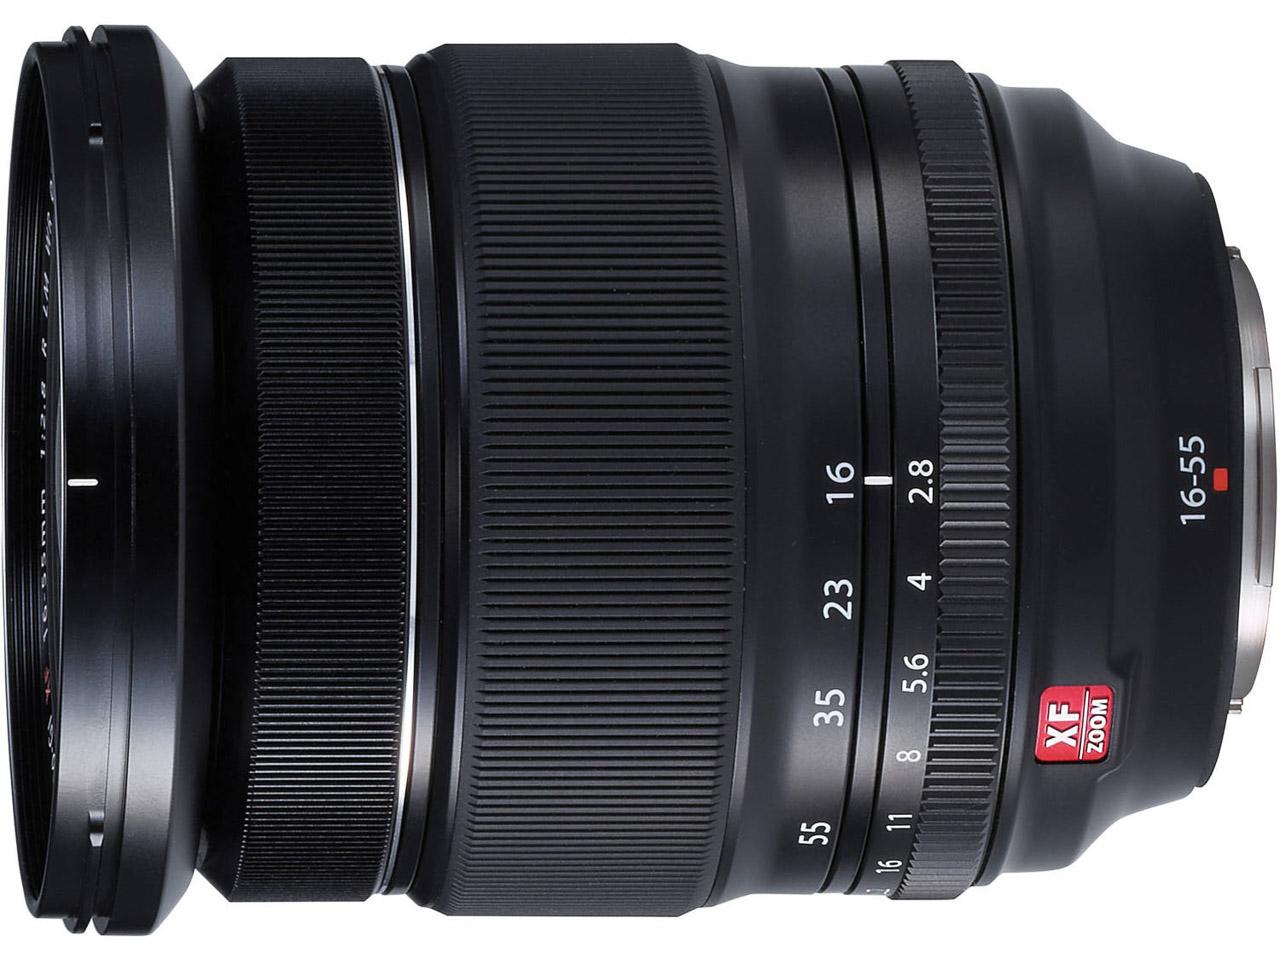 Fuji 16-55mm f/2.8 R LM WR